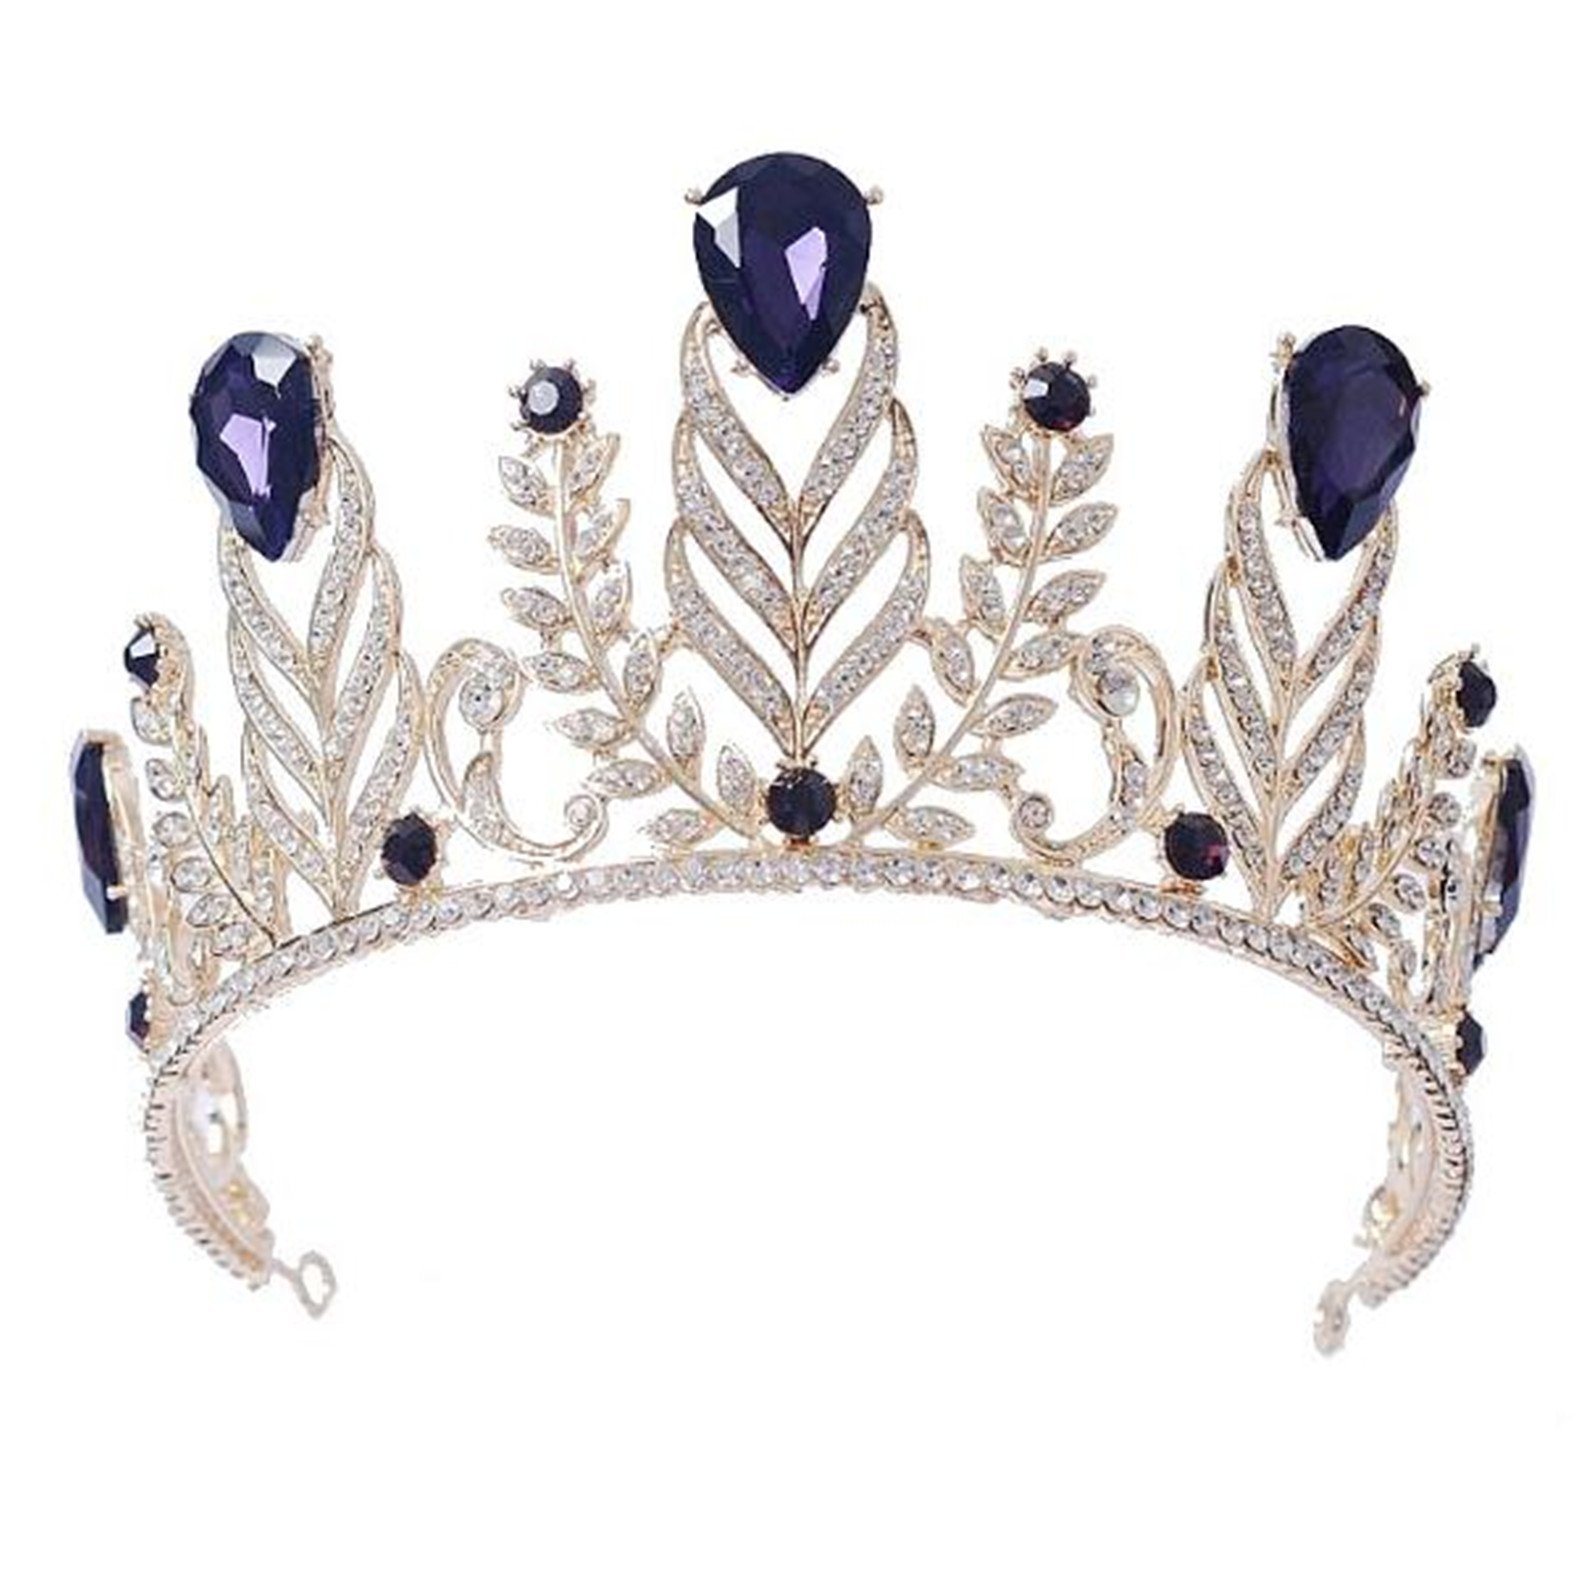 Wiipu Vintage Rhinestone Feather Crown Wedding Crystal Leaf Bride Tiara Headband(A1346) (Purple)